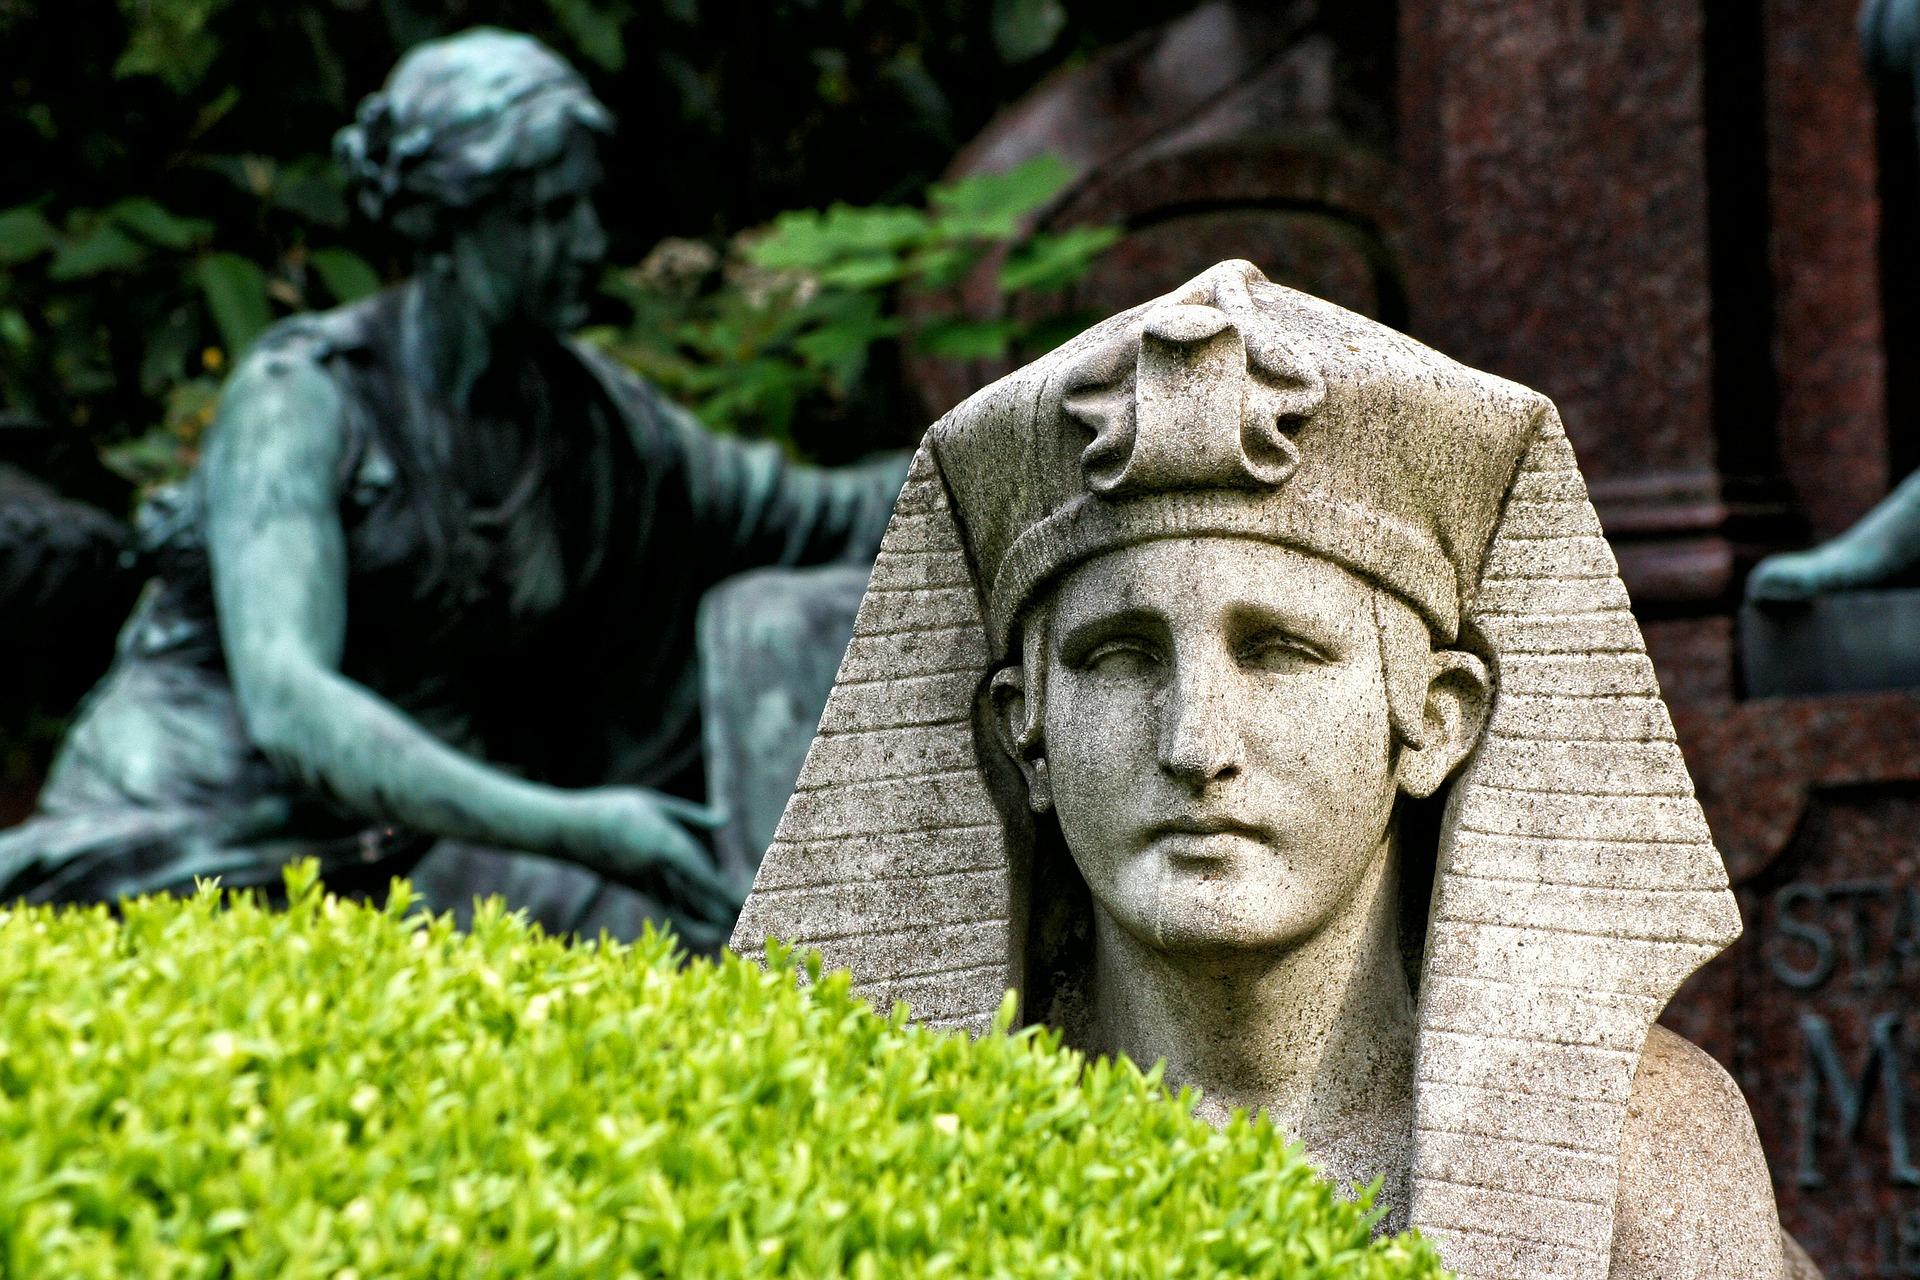 Stadtführung Zentralfriedhof - Central Cemetery